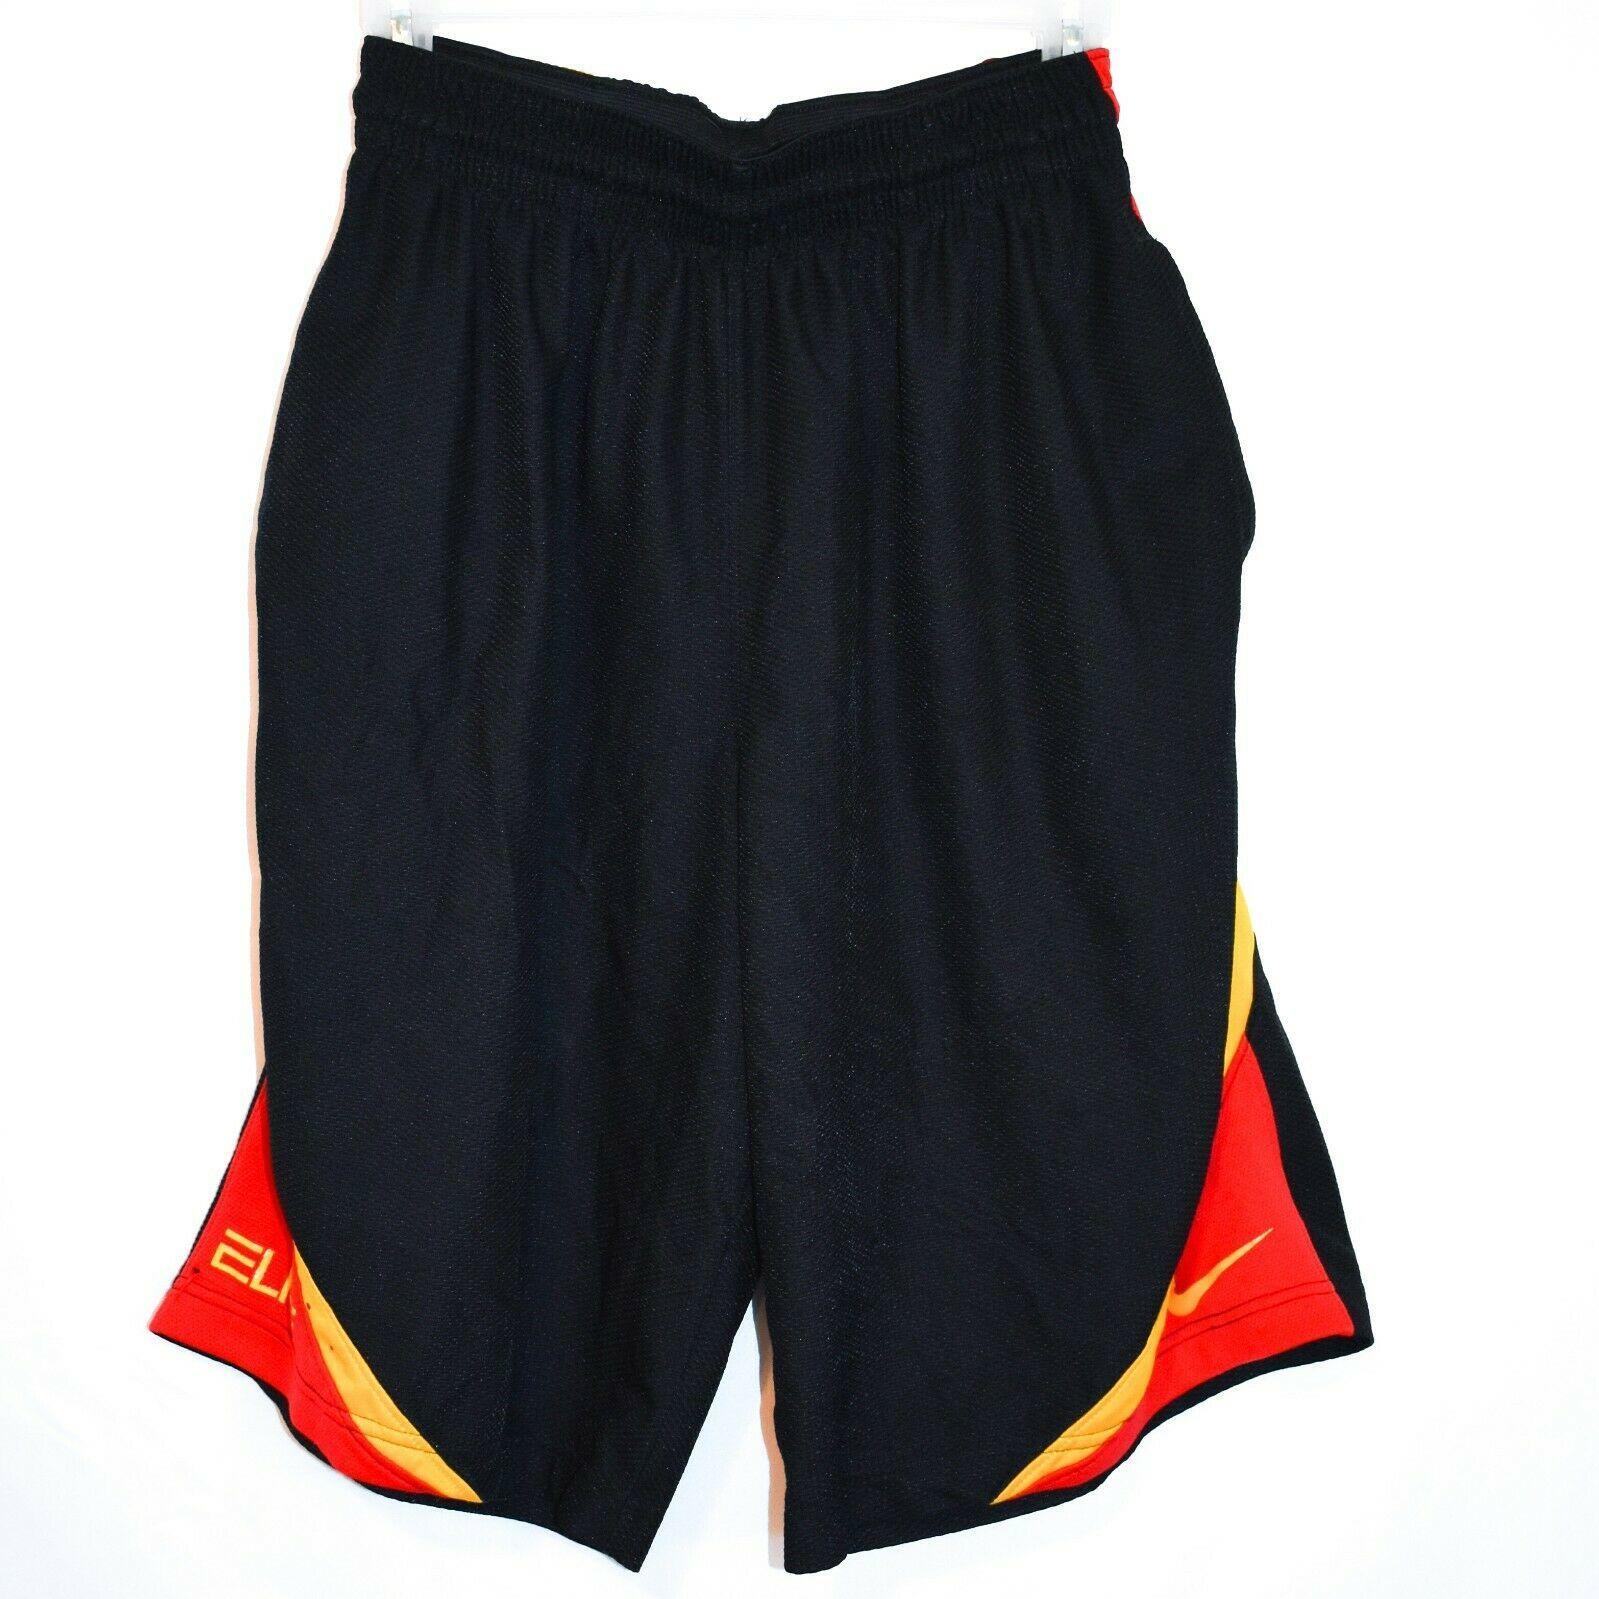 Nike Dri-Fit Elite Black Red Yellow Men's Athletic Basketball Shorts Size S